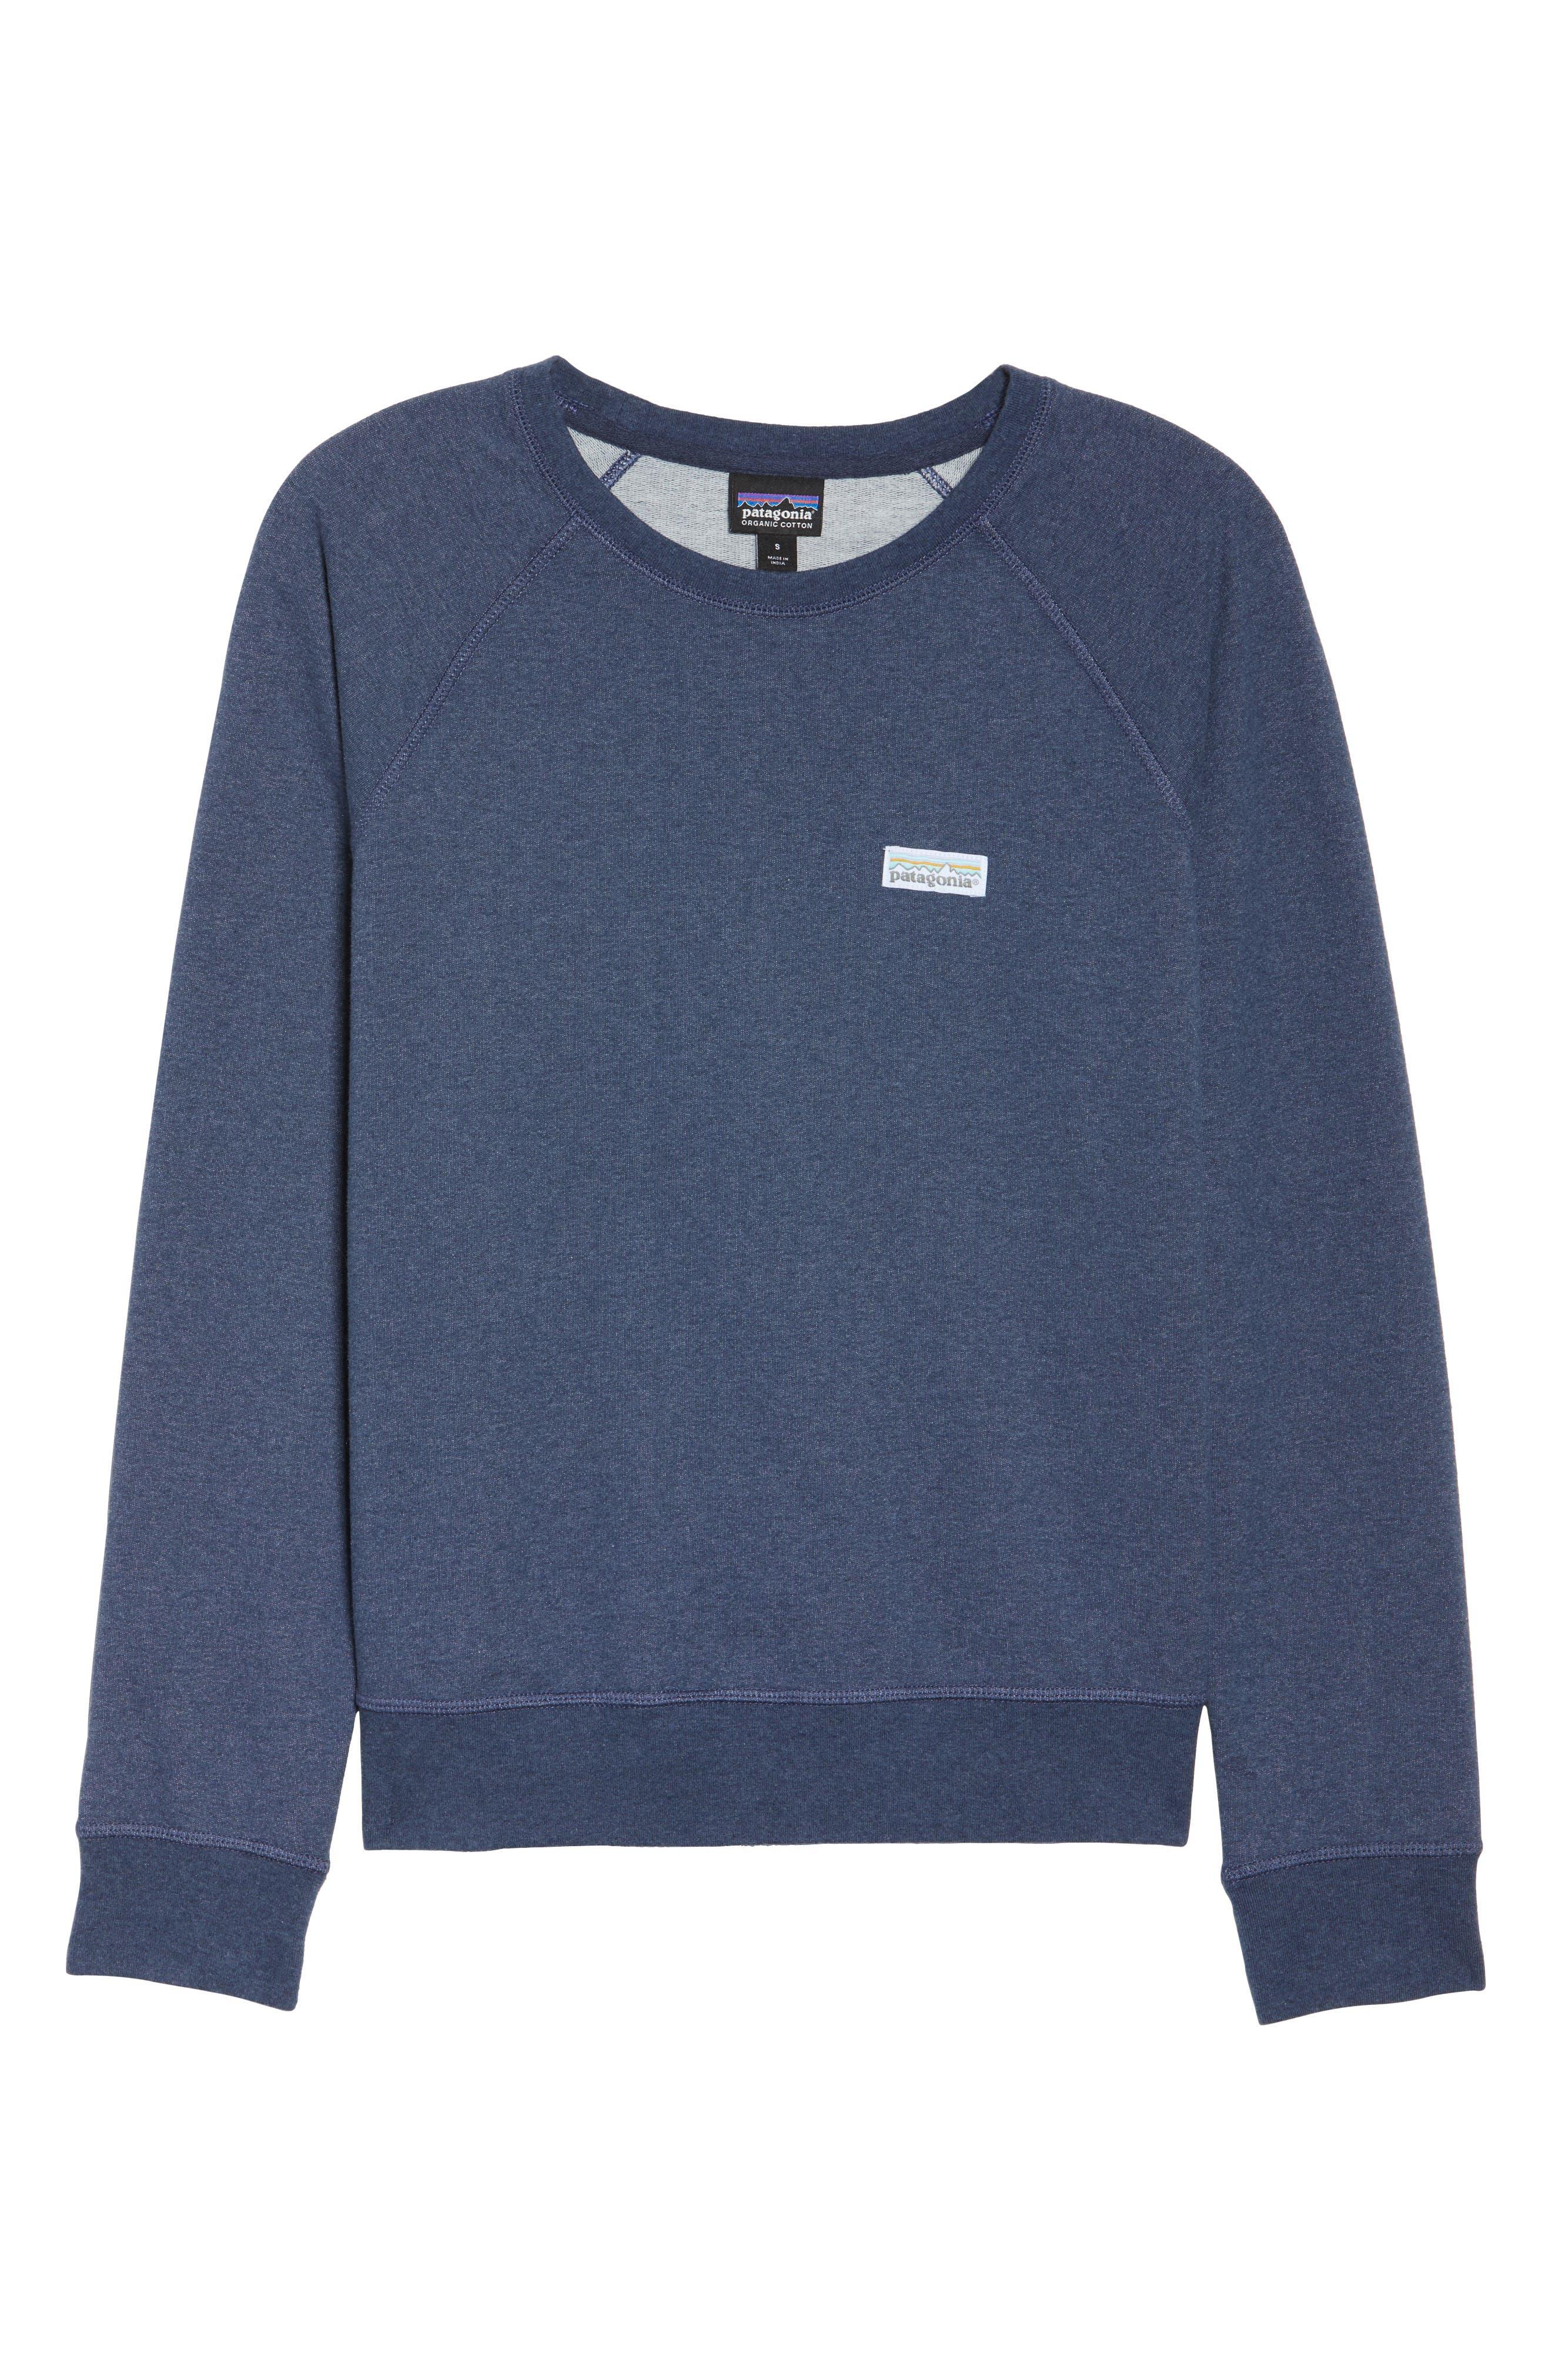 Pastel P-6 Label Midweight Sweatshirt,                             Alternate thumbnail 7, color,                             Classic Navy